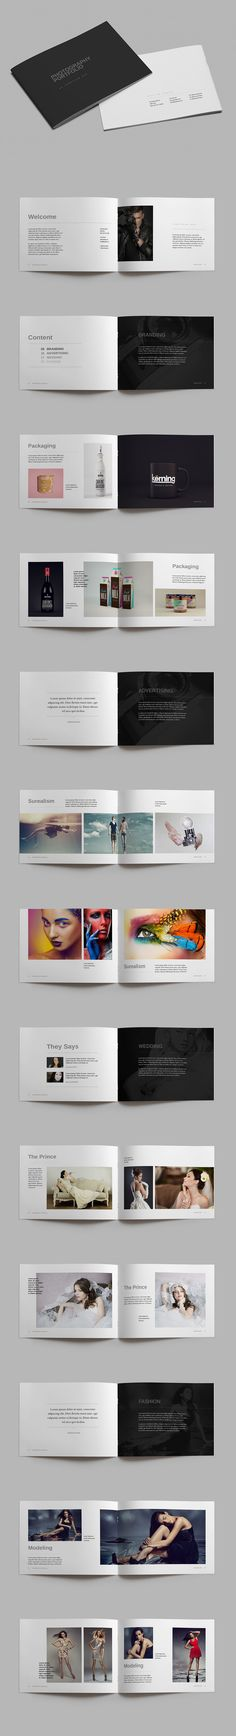 Multipurpose Business Tri-Fold Brochure Vol-4 Creative, Brochures - fashion design brochure template